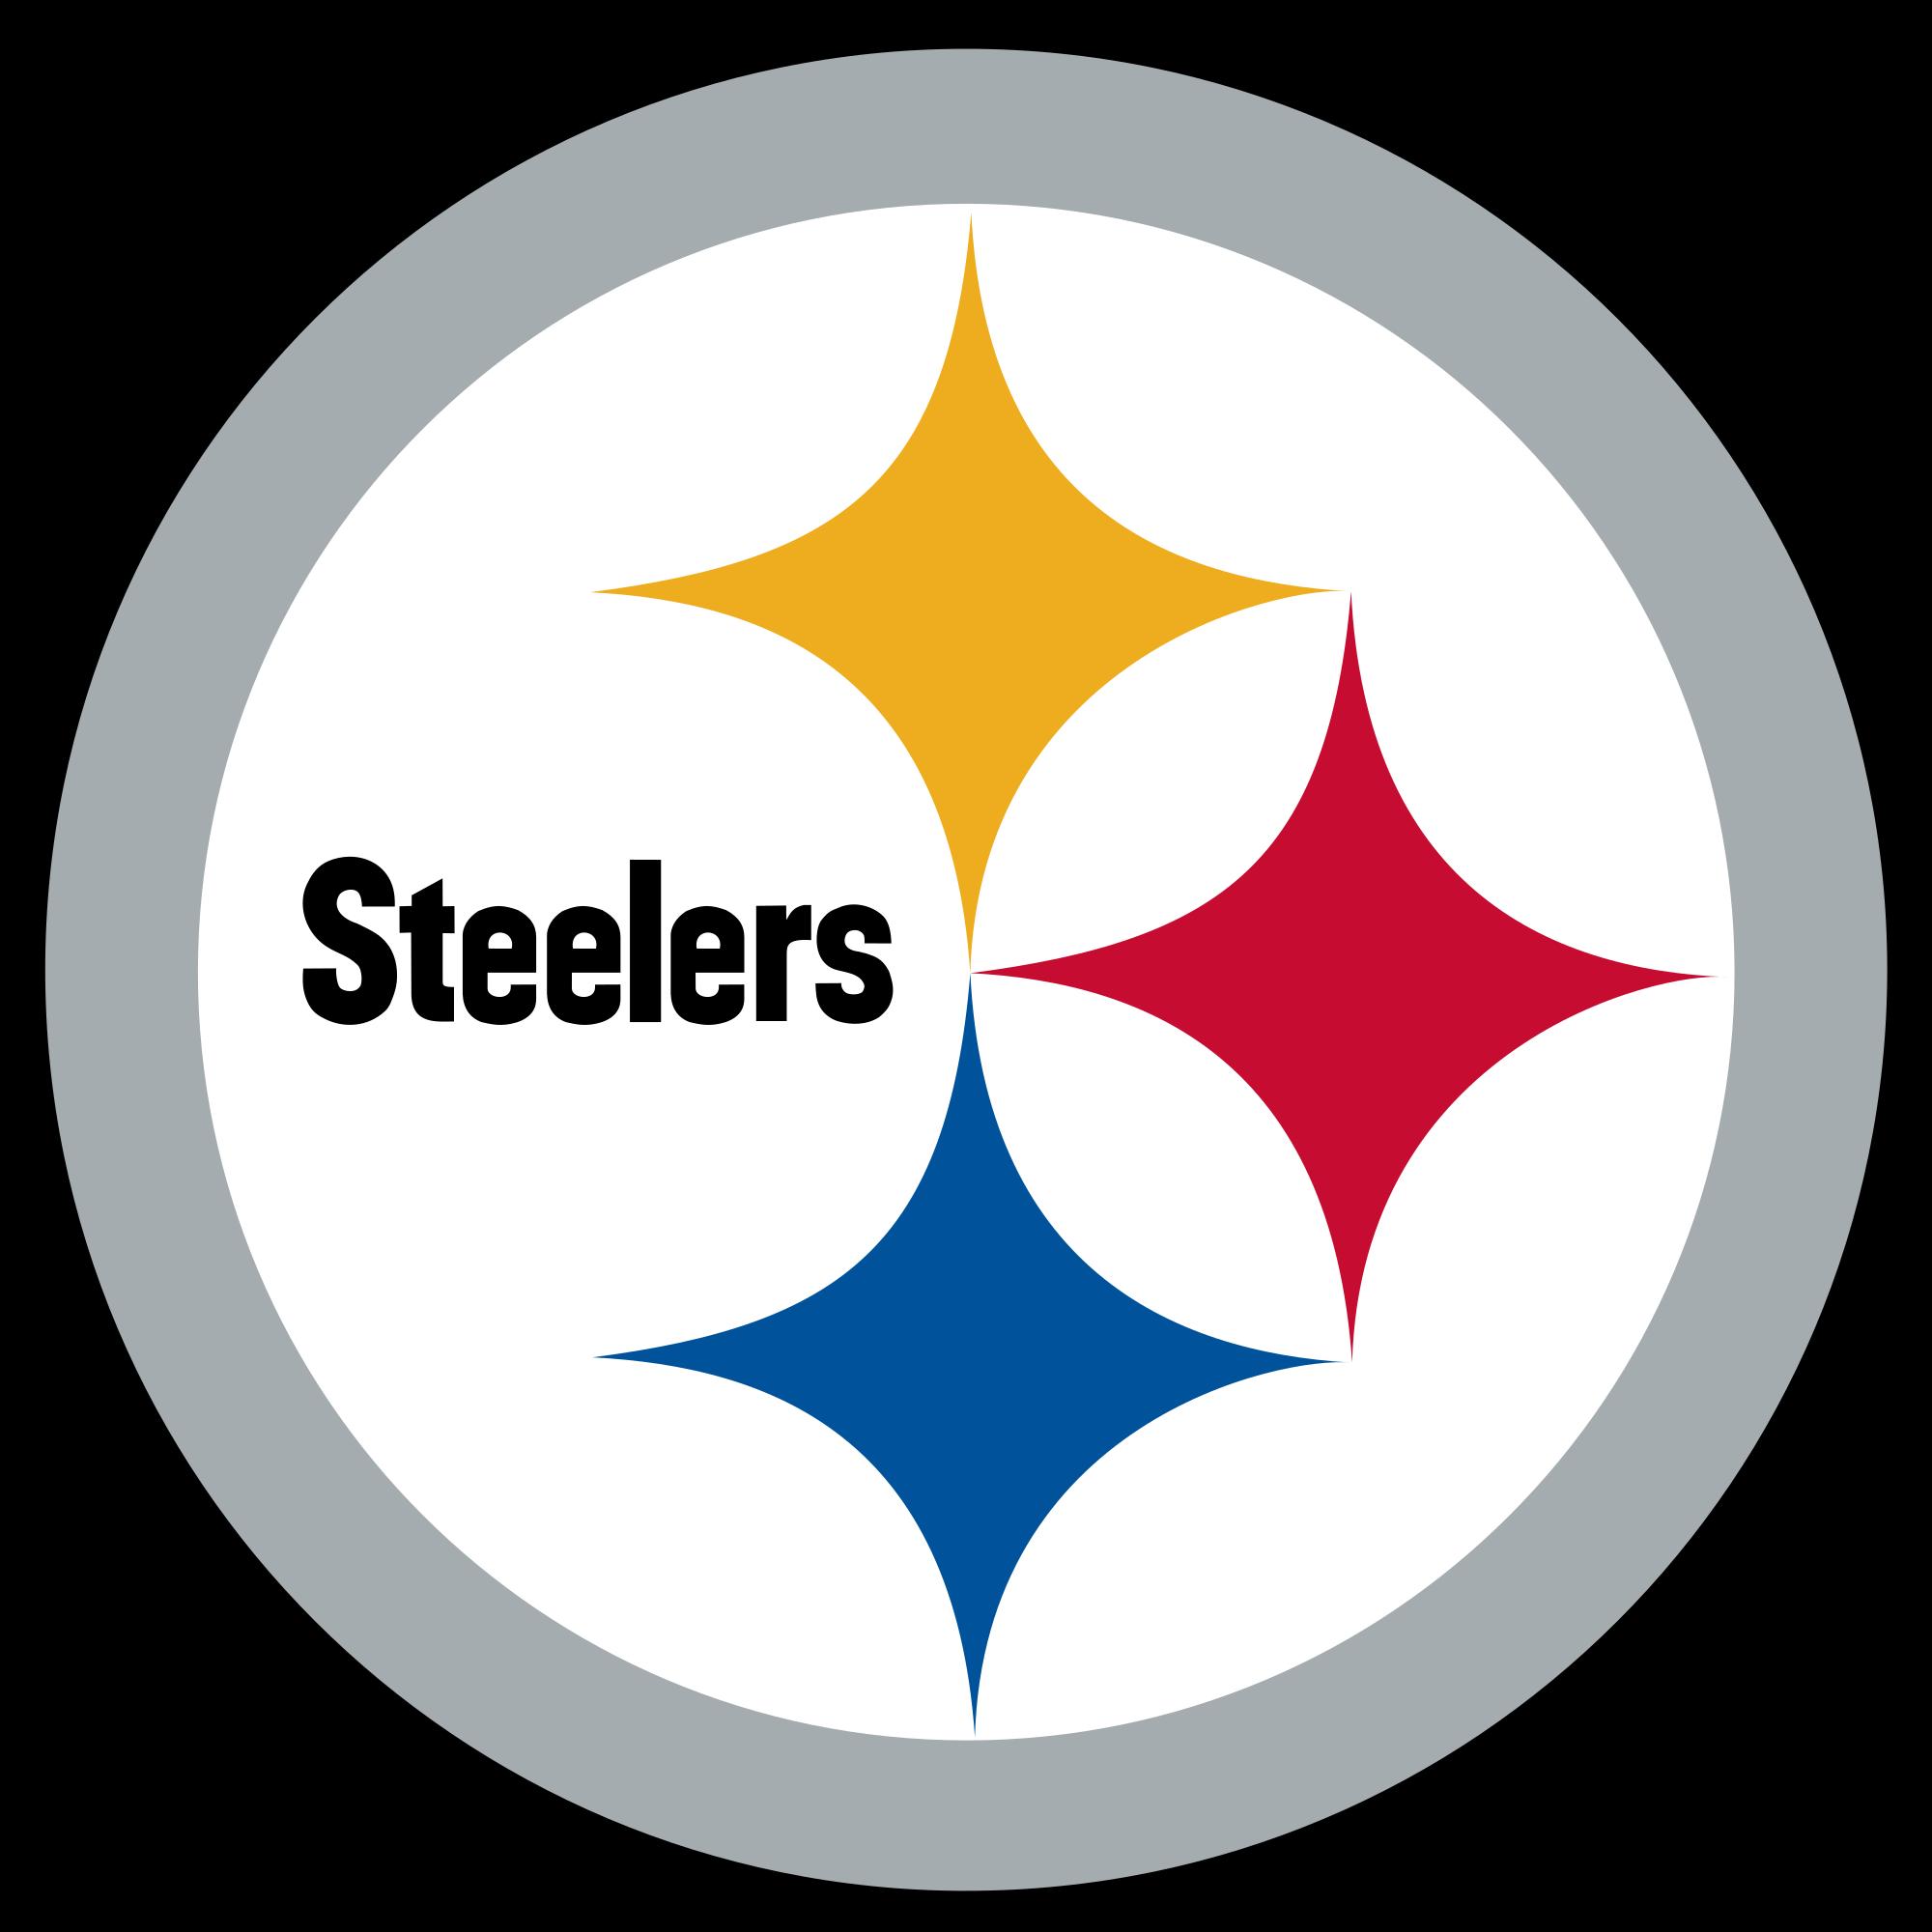 Pin By Chris Colbert On Diy Pittsburgh Steelers Logo Pittsburgh Steelers Pittsburgh Steelers Football